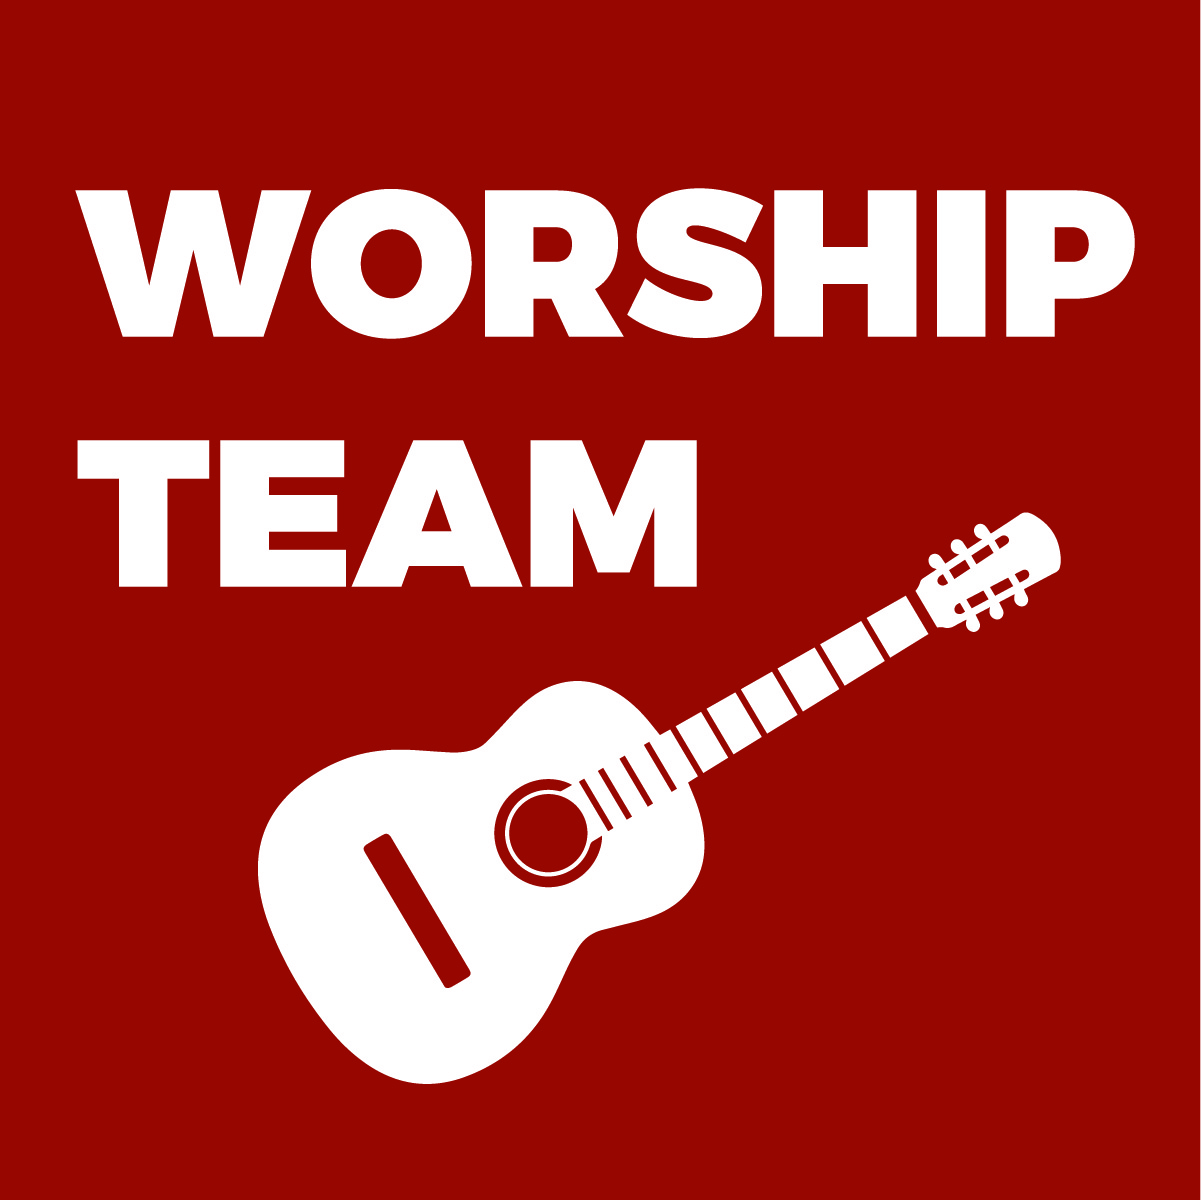 Instruments, Vocals, Worship Leading